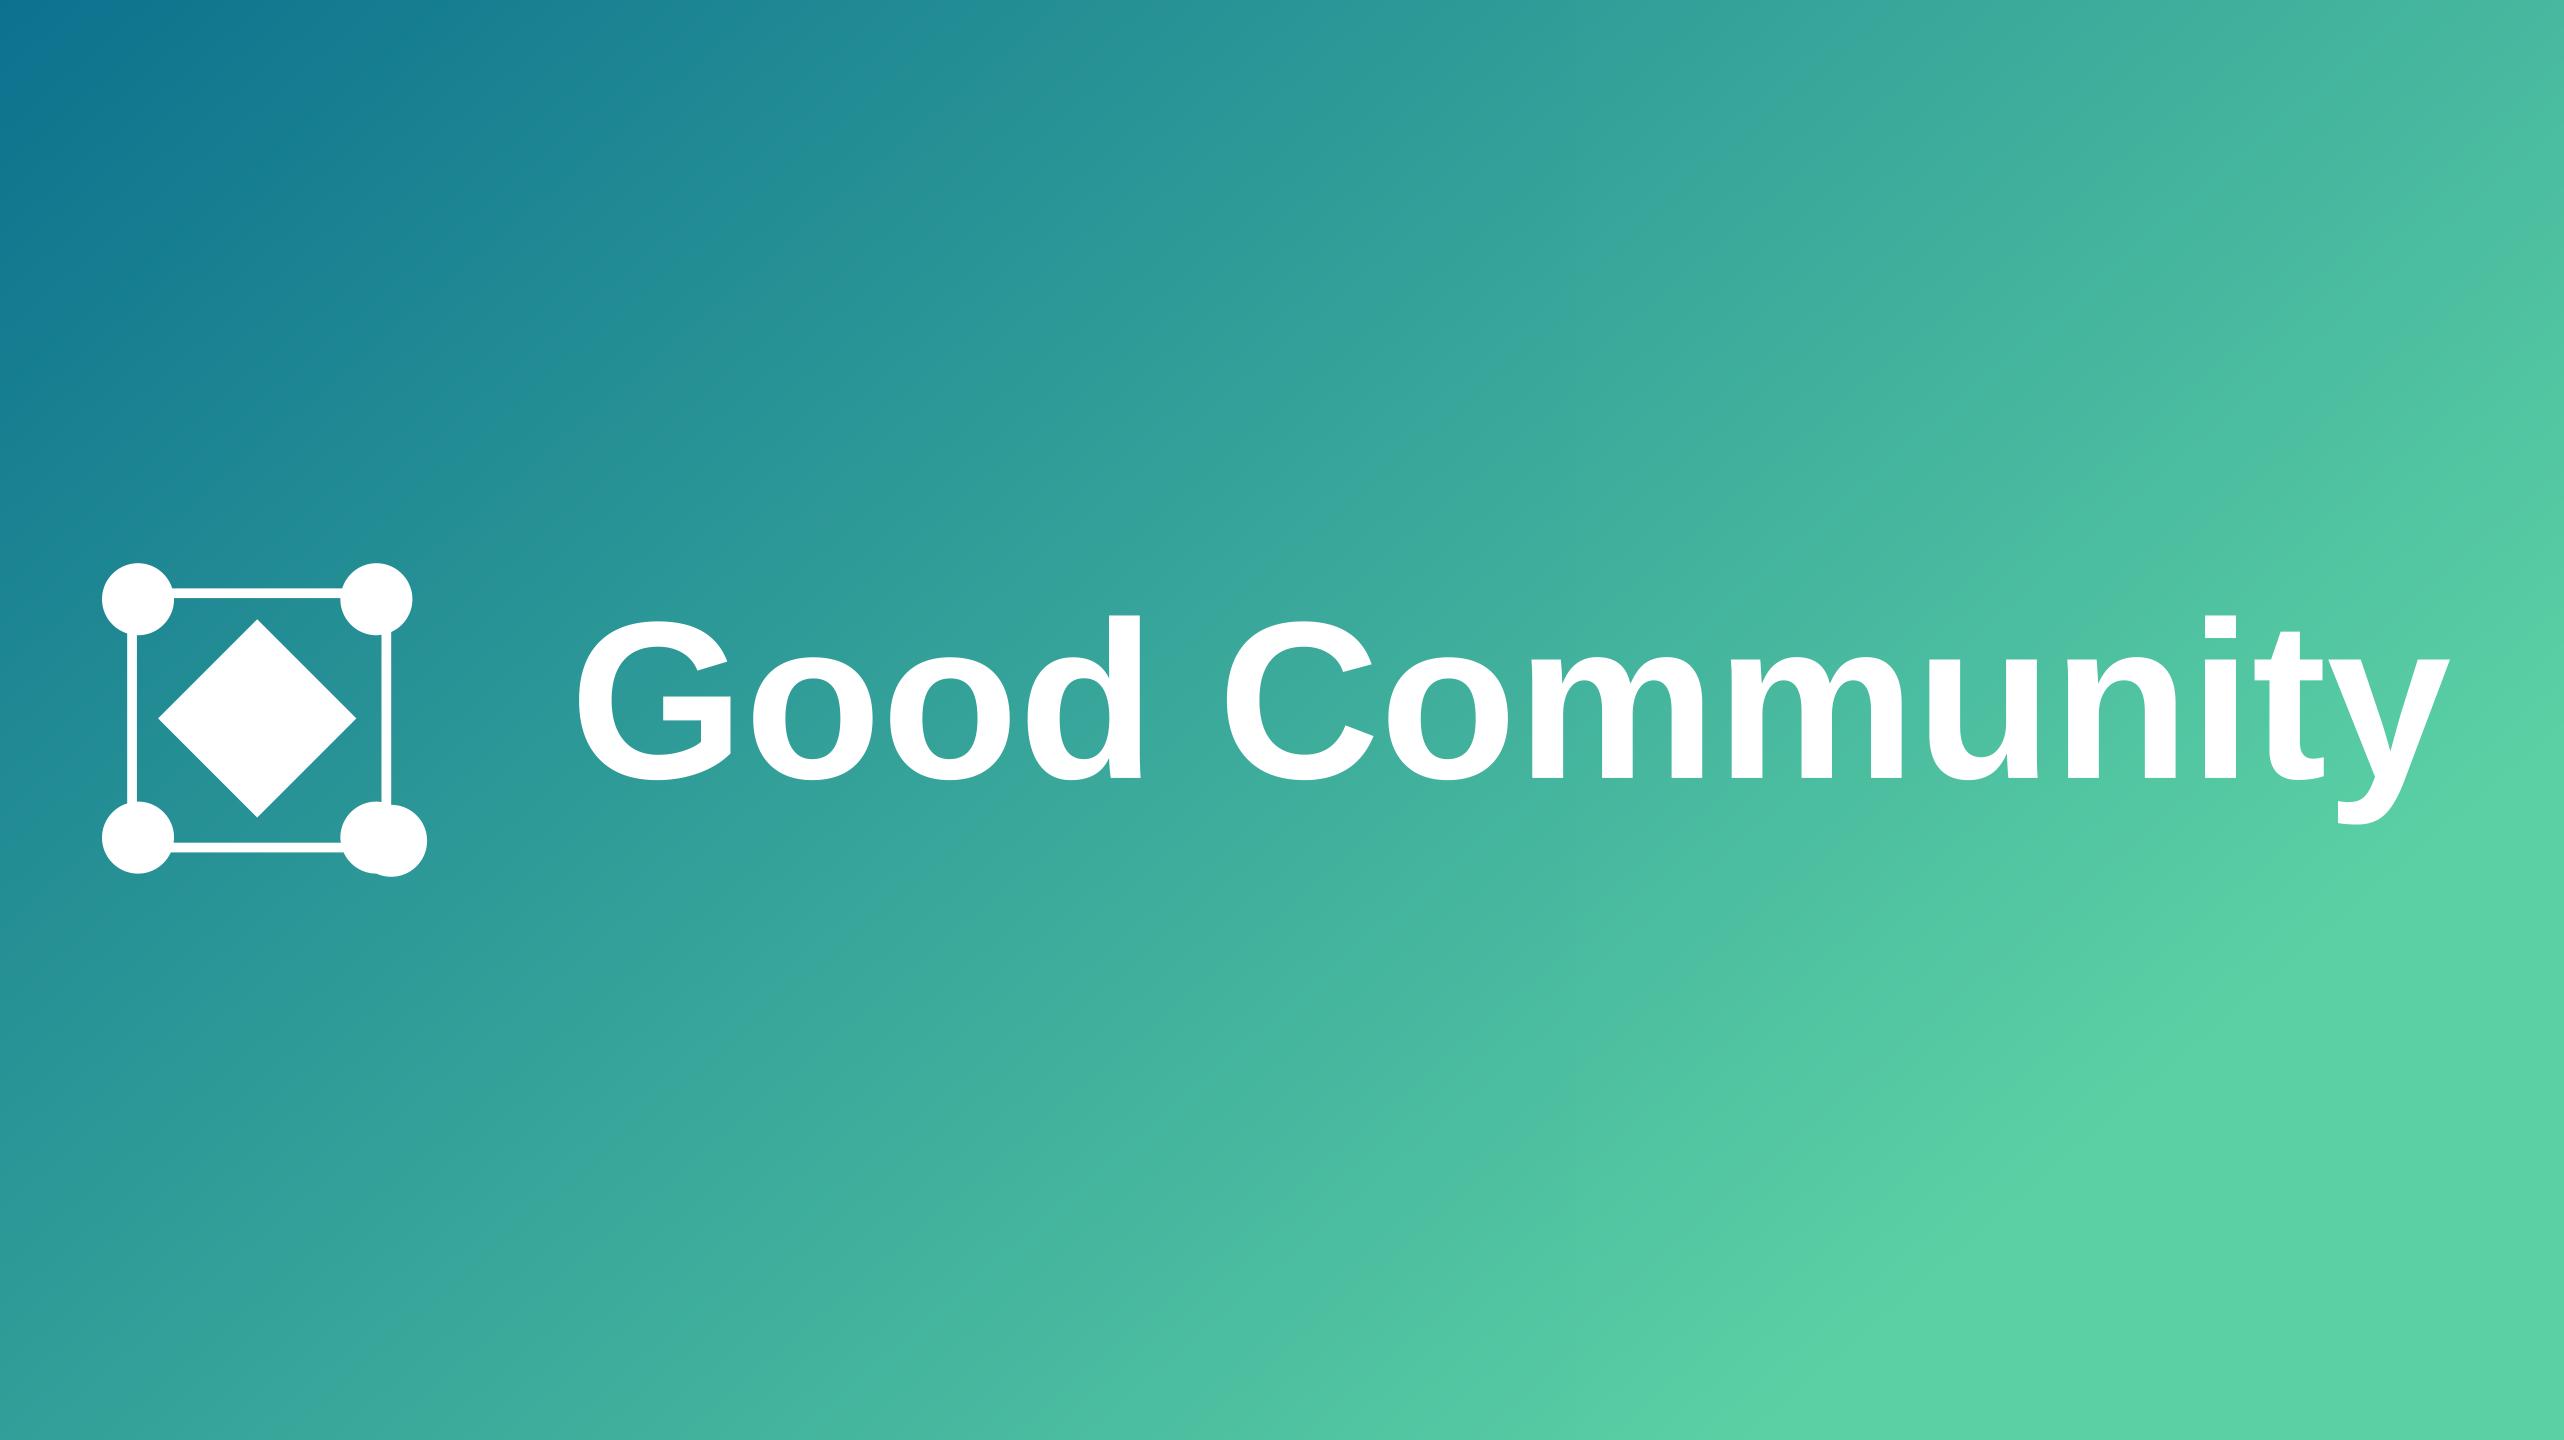 Good community